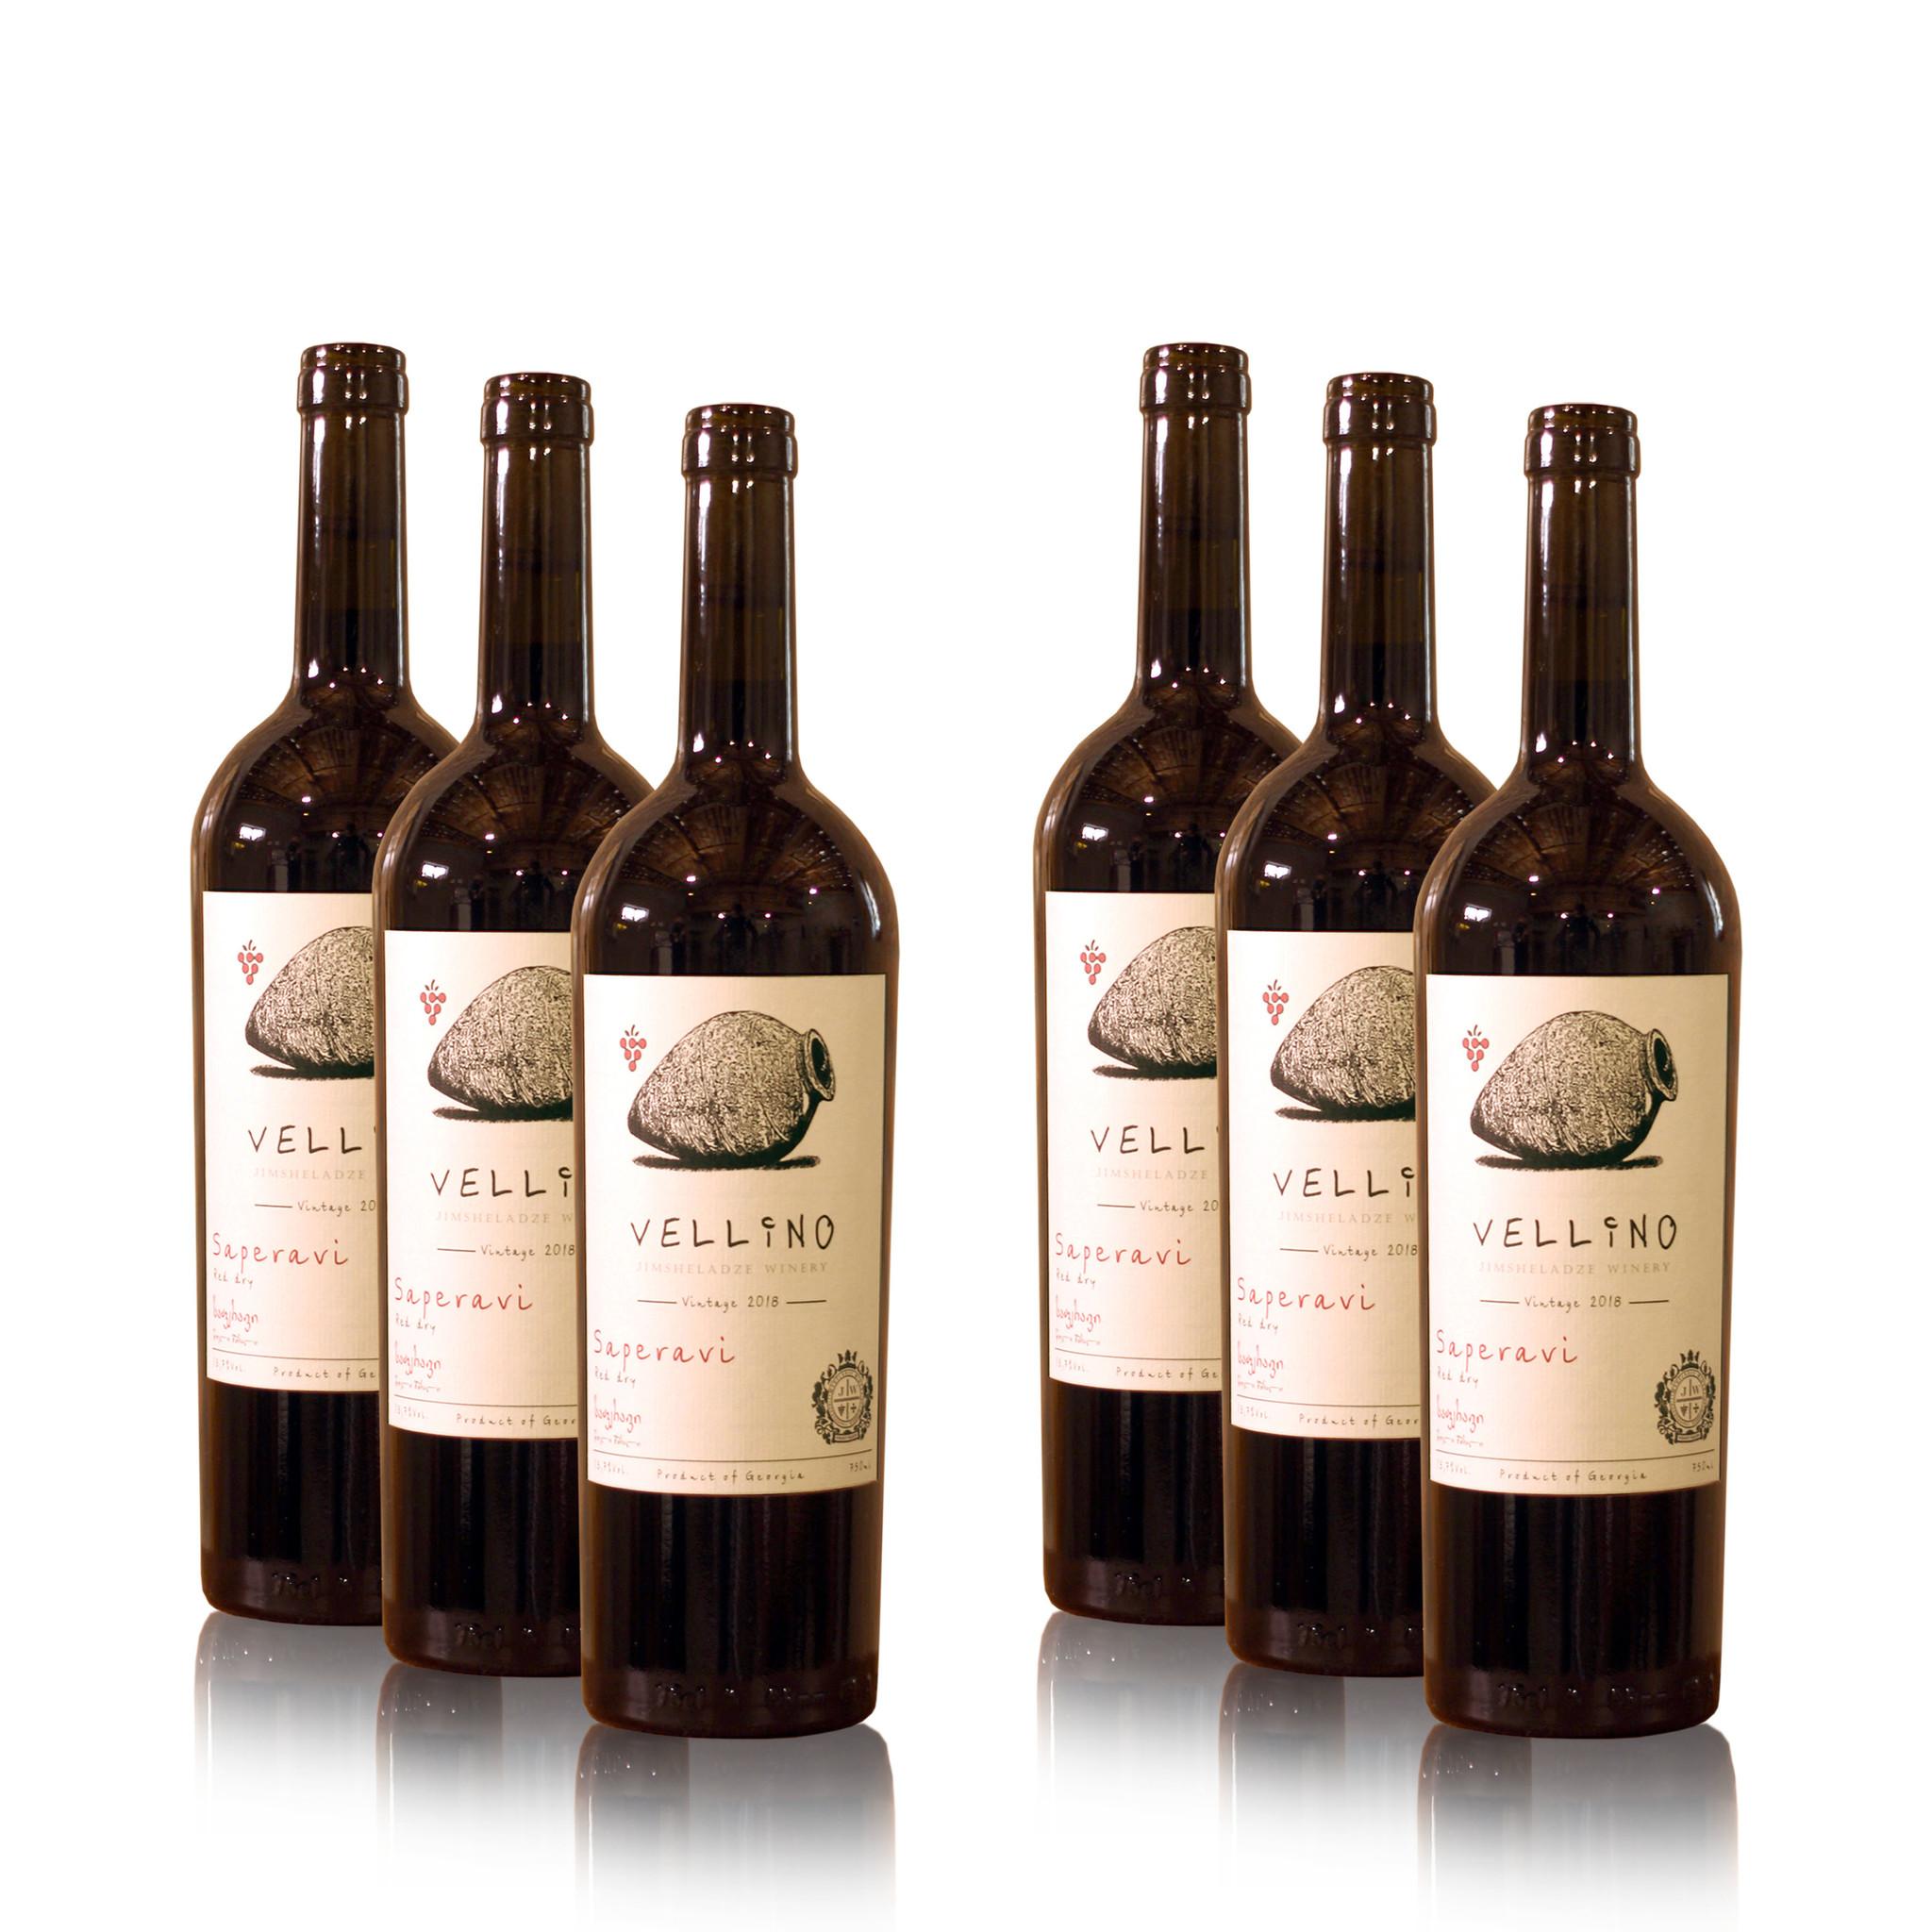 Merk Vellino Saperavi Vellino Qvevri 2018, rode droge wijnen (6x)